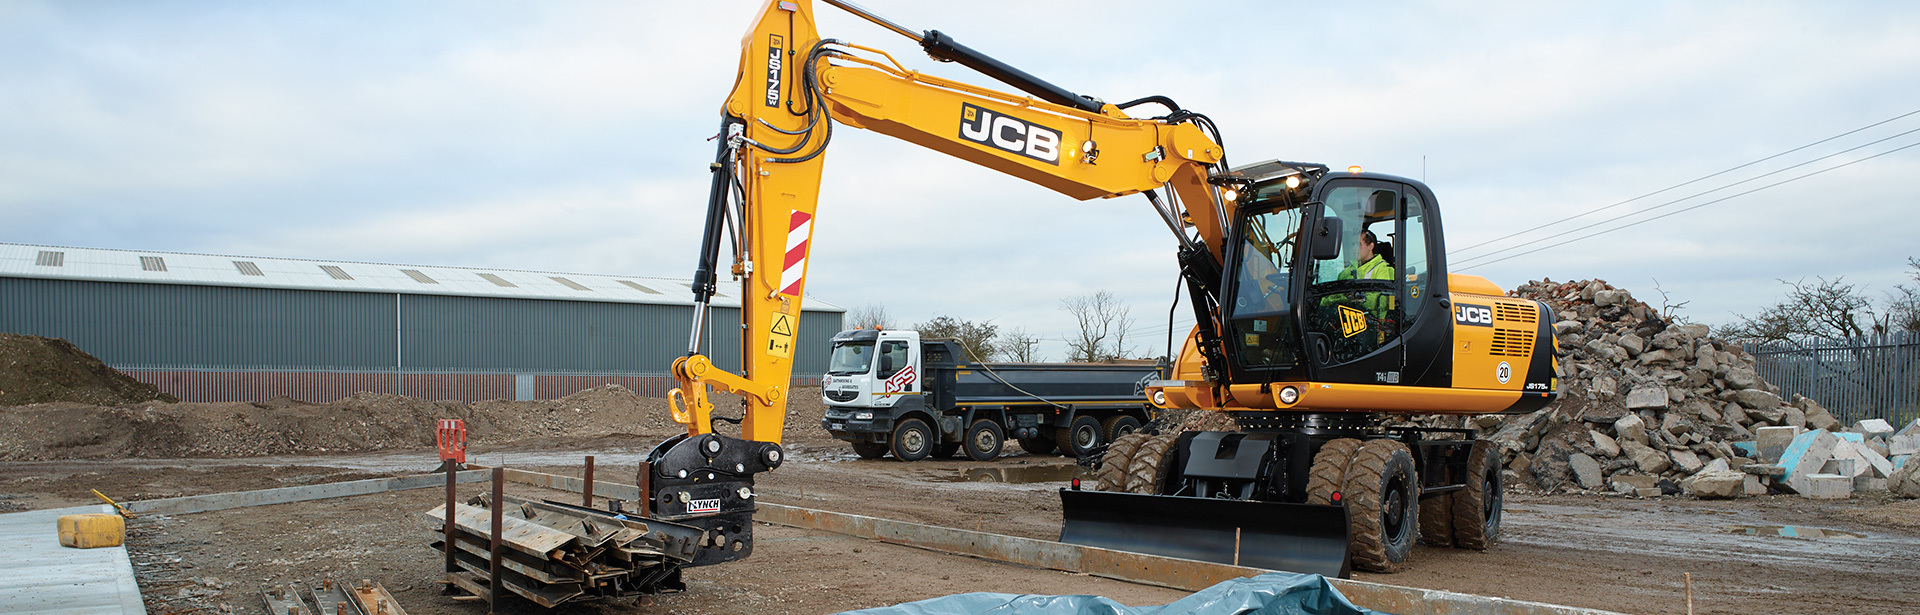 JS175 Wheeled Excavators Saudi Arabia, JCB Dealer - Abunayyan JCB